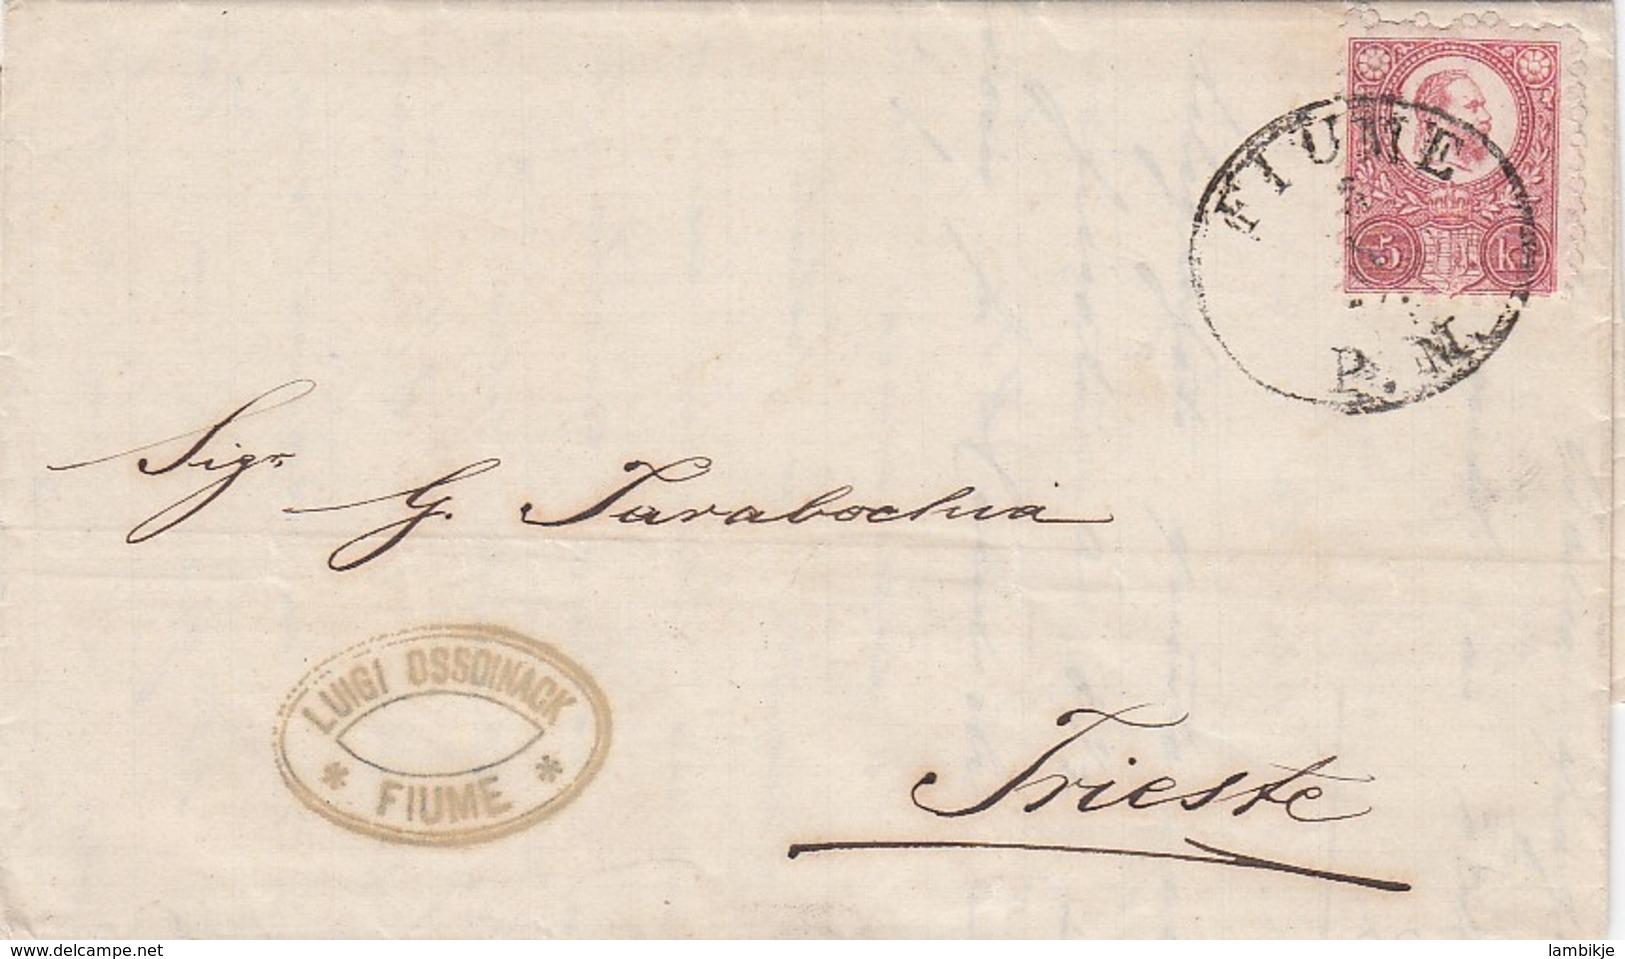 Österreich Brief 1874 Fiume - Briefe U. Dokumente